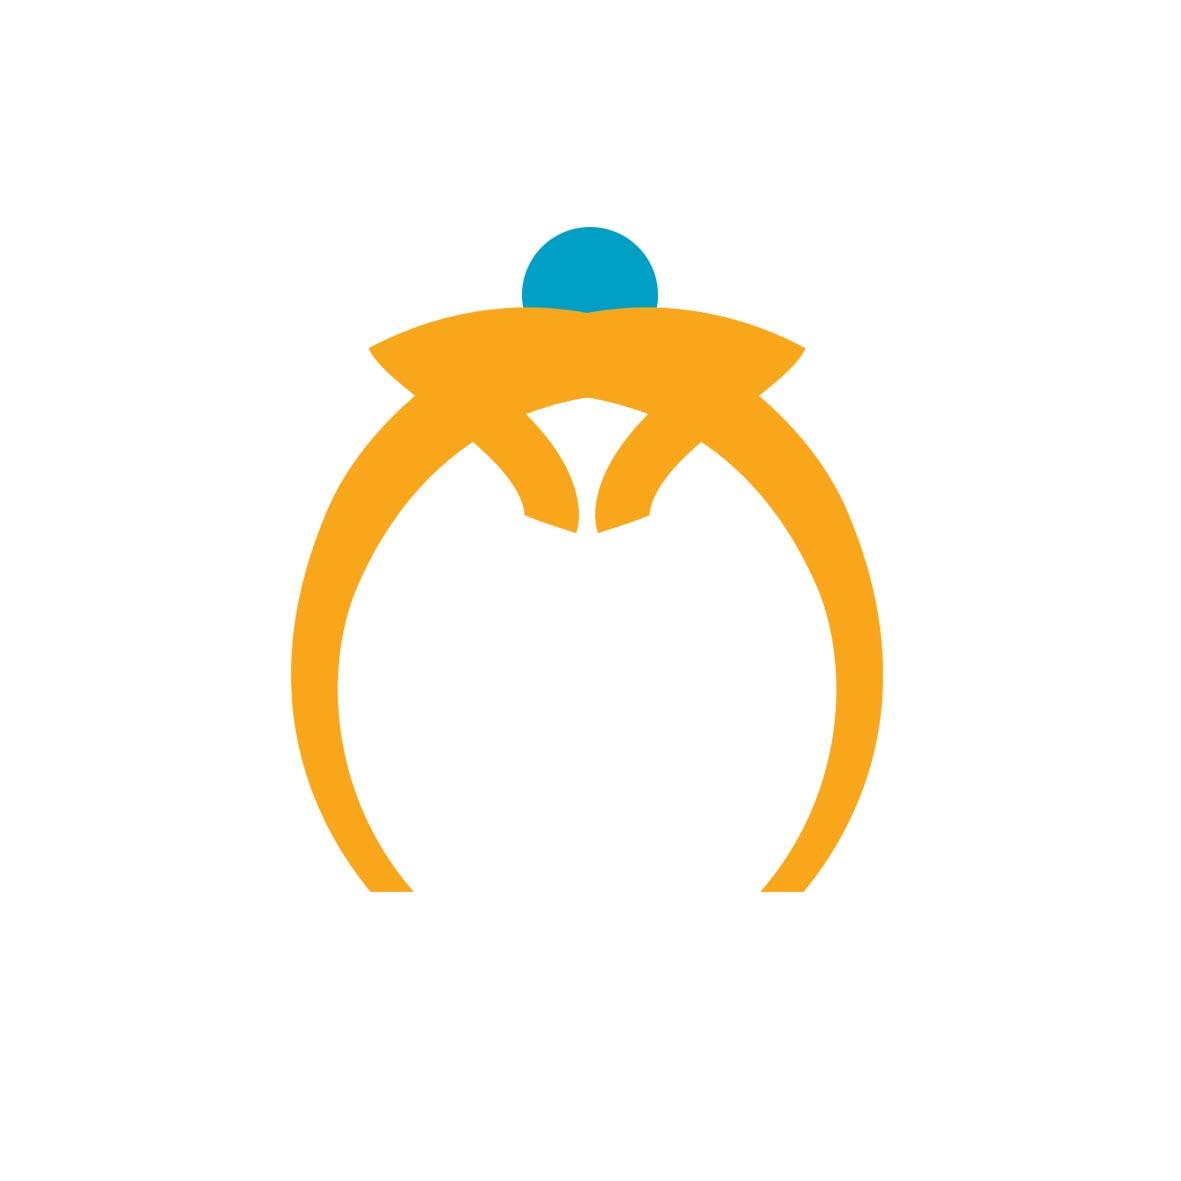 jj珠宝公司英文logo设计